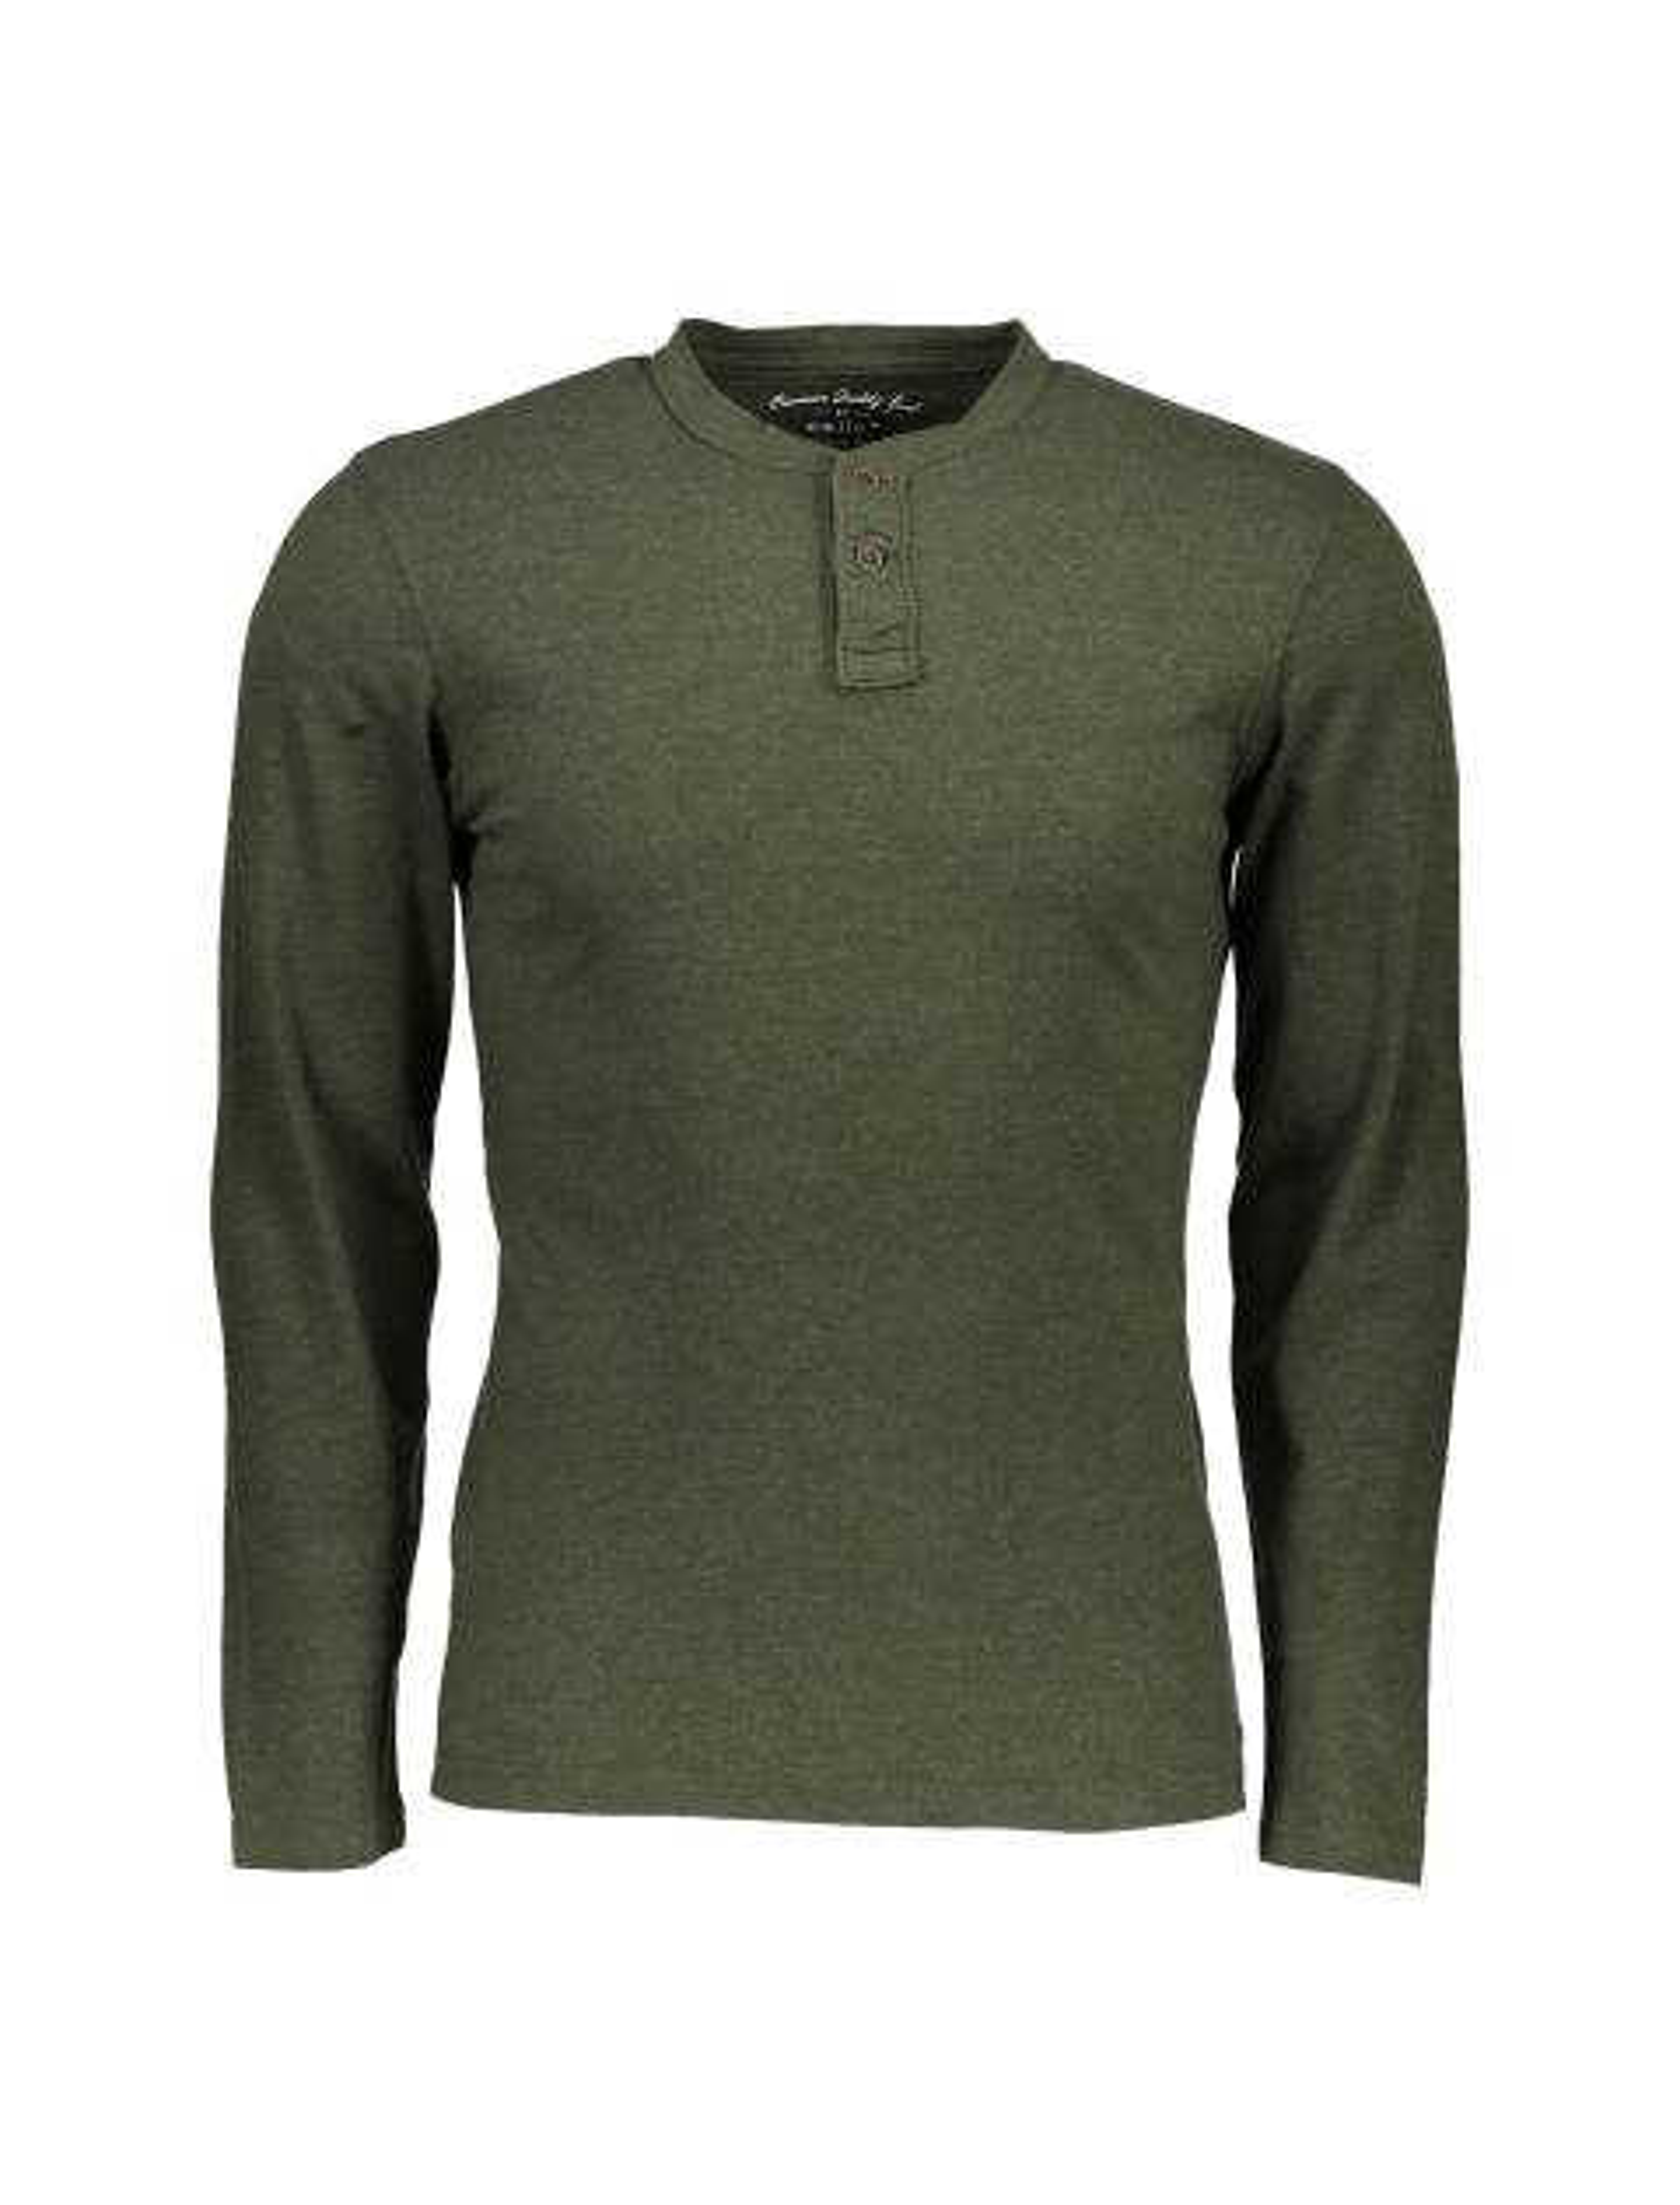 تی شرت نخی یقه گرد مردانه - سلیو - زيتوني - 1